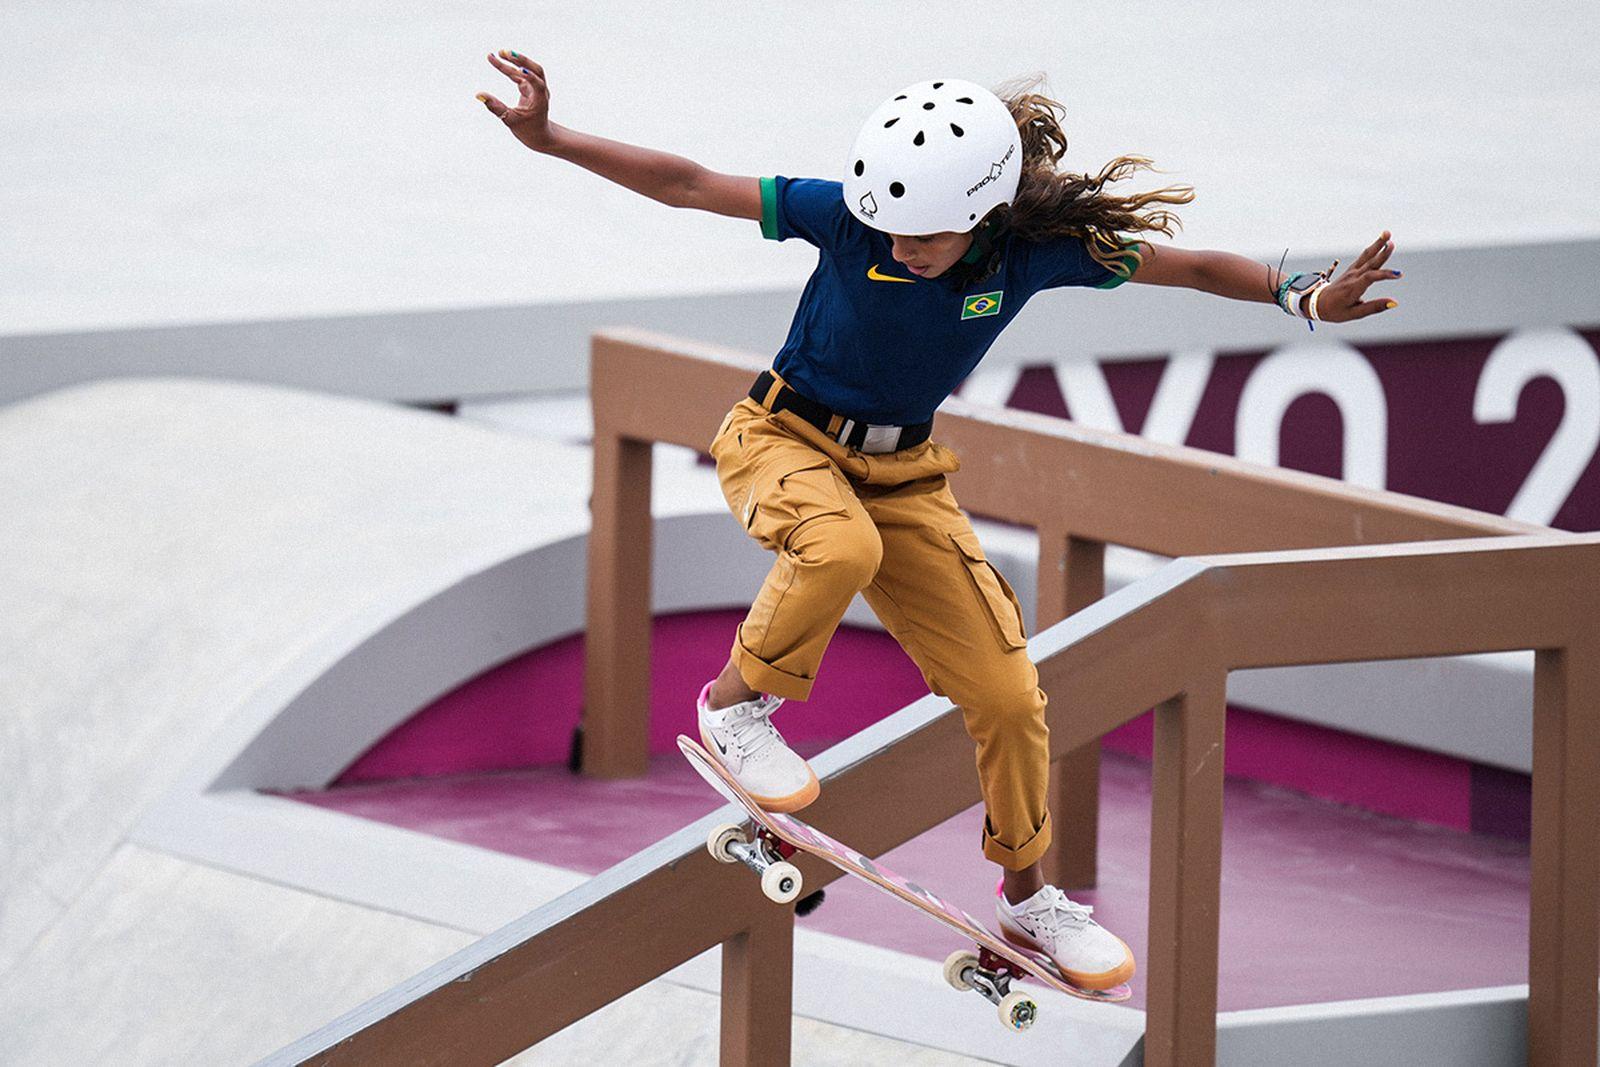 skate-style-tokyo-olympics-03